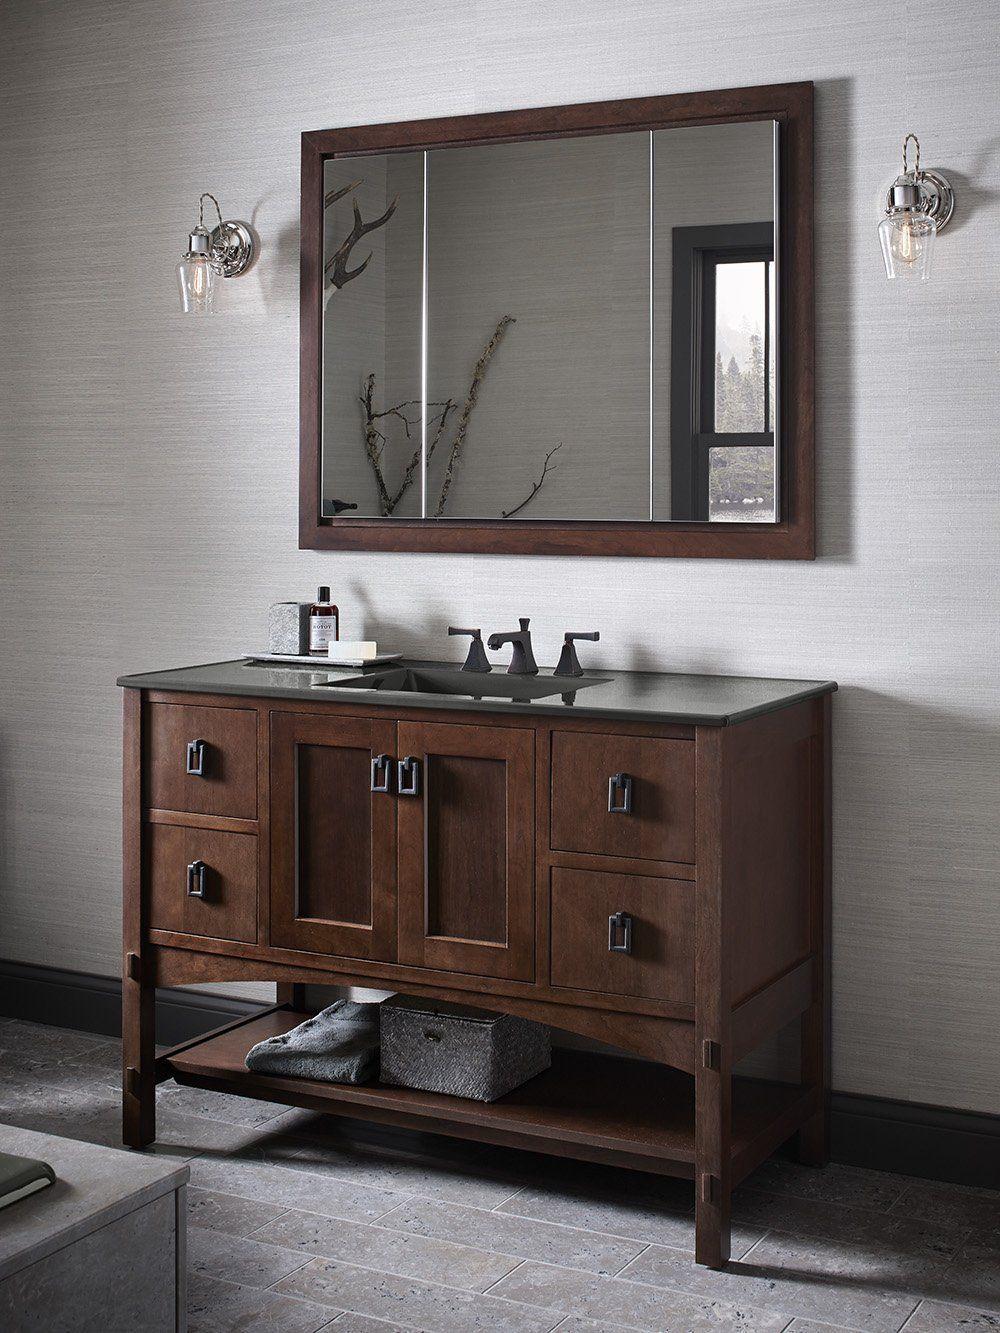 Kohler K99011Na Verdera 40Inch30Inch Slowclose Medicine Magnificent 40 Inch Bathroom Vanity Decorating Design